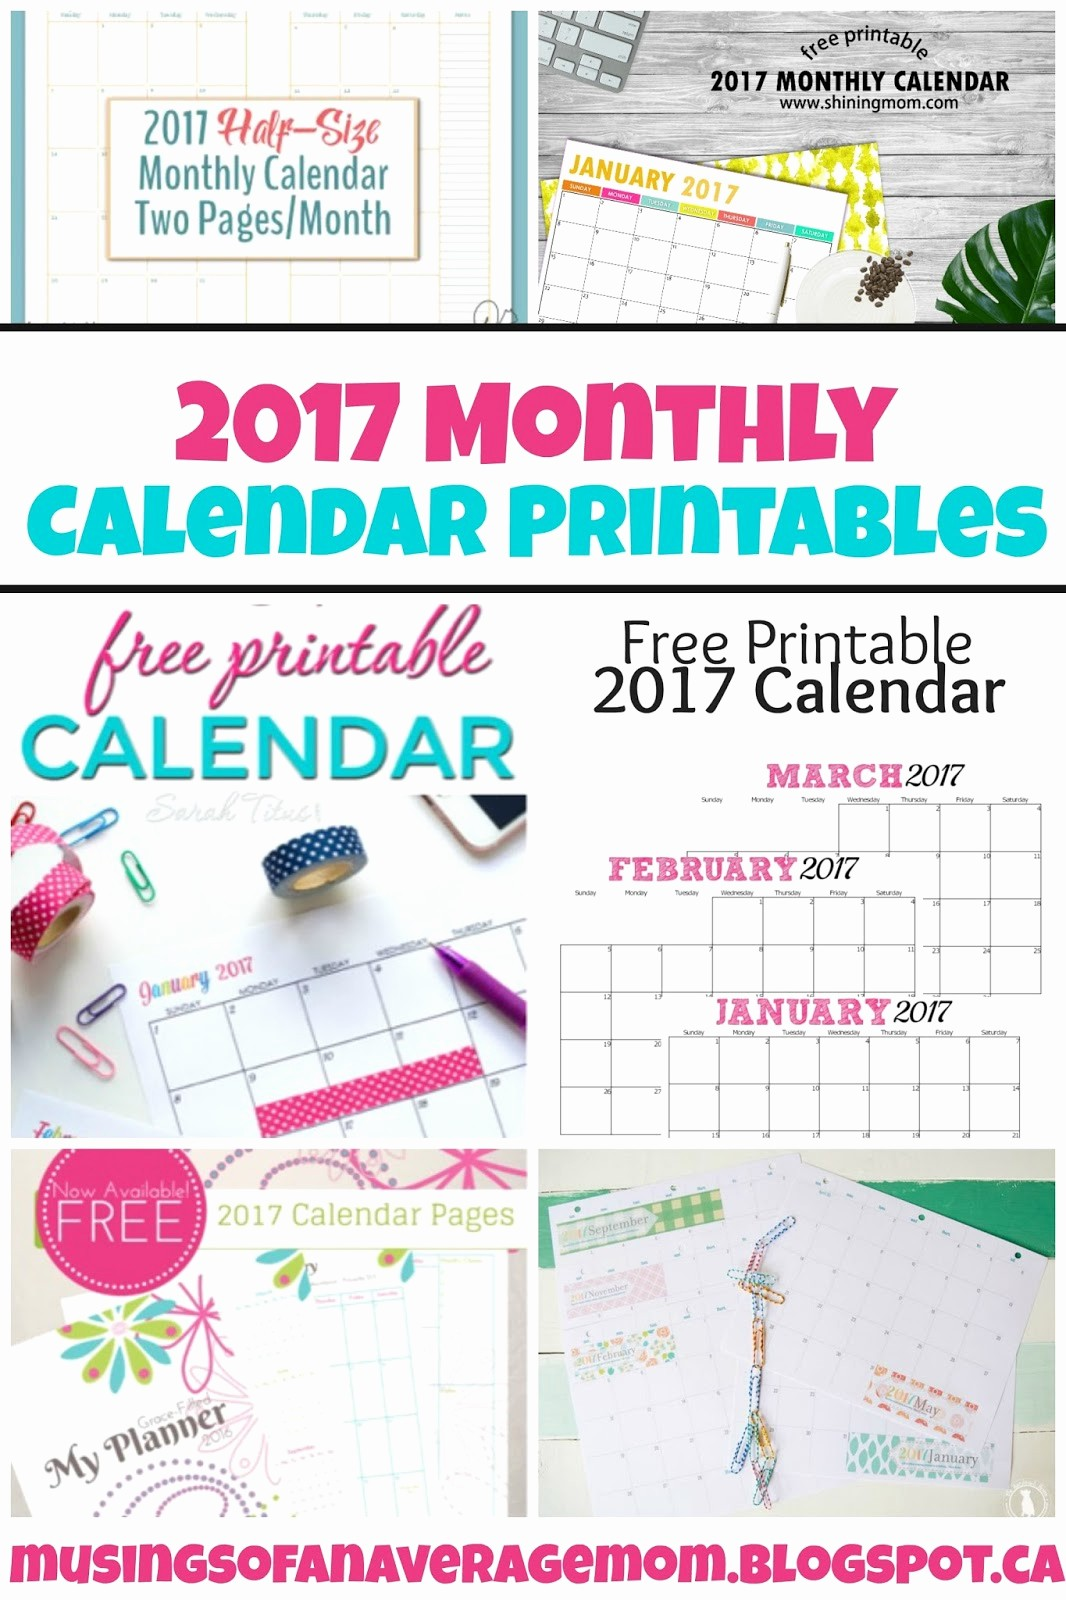 Free Printable Monthly 2017 Calendar Elegant Musings Of An Average Mom 2017 Monthly Calendars